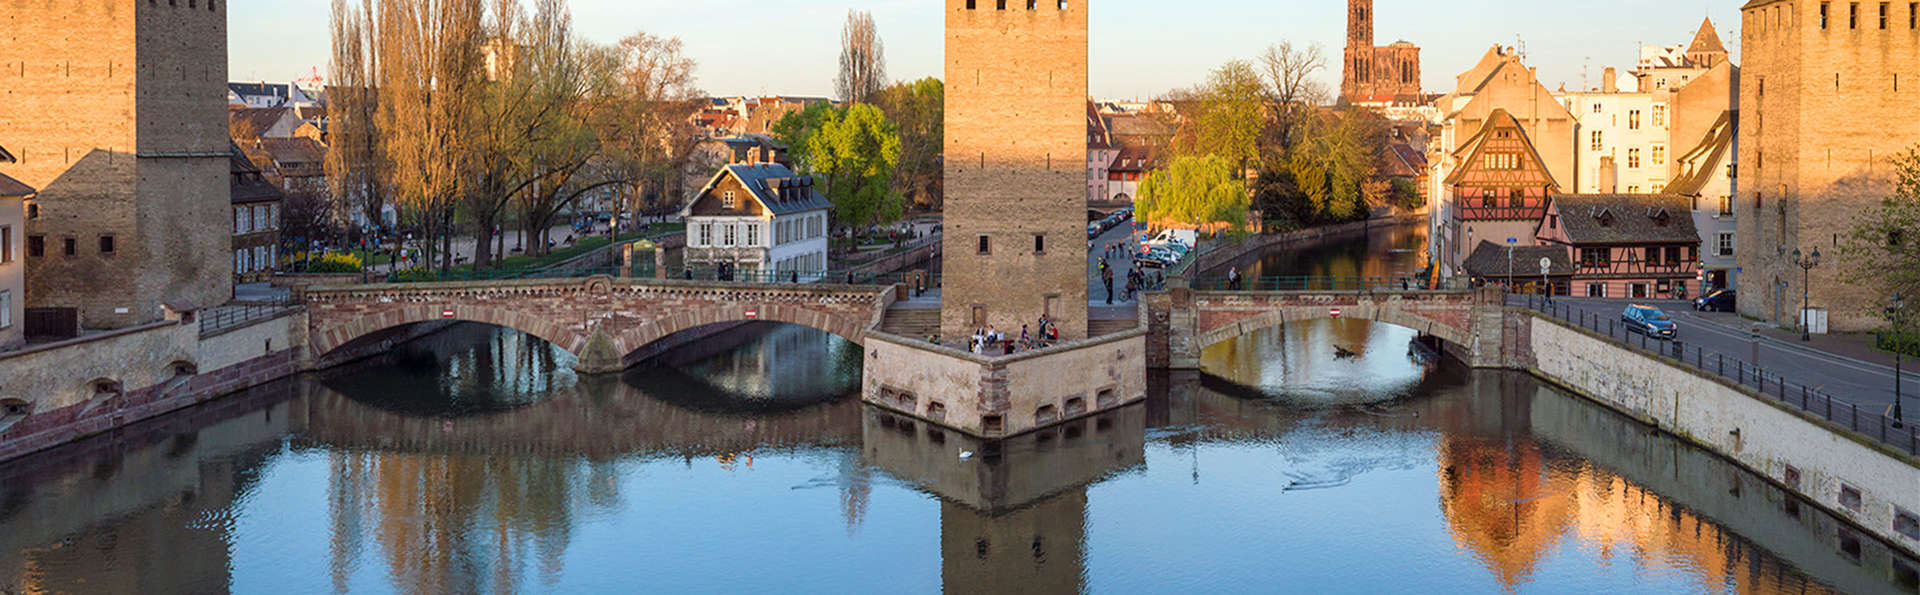 Hôtel de l'Europe Strasbourg by HappyCulture - edit_Strasbourg_Ponts_couverts_au_coucher_du_soleil.jpg